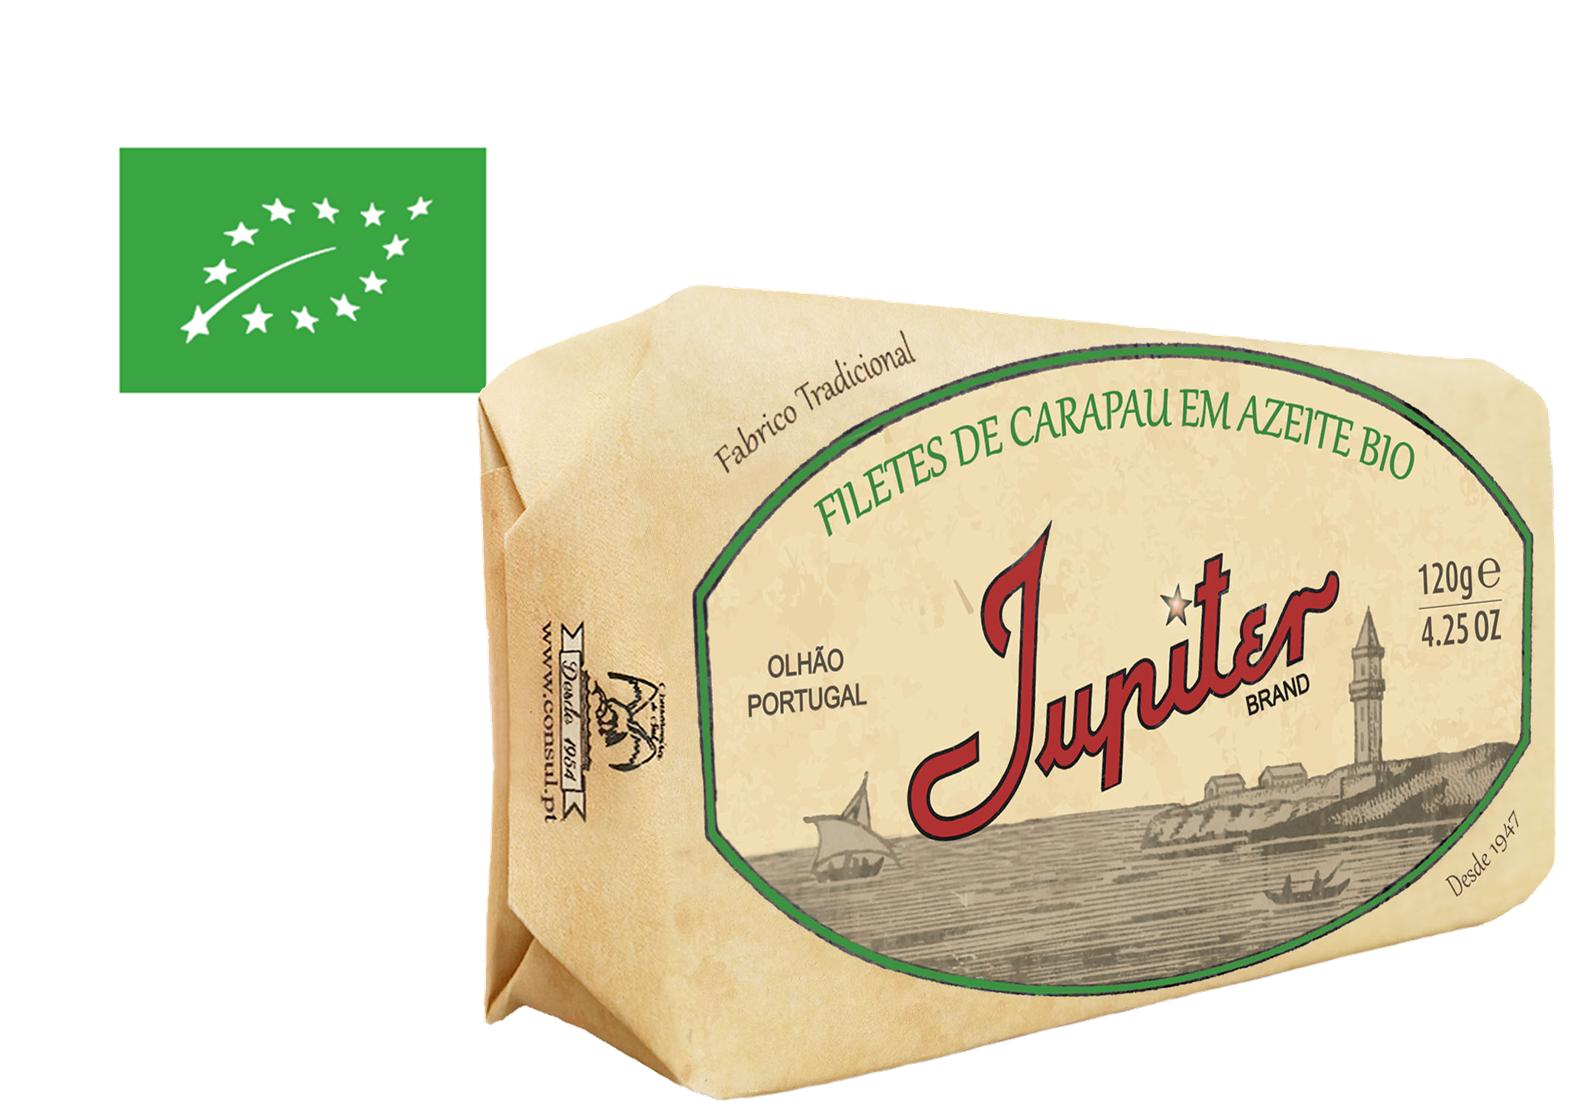 Filets de chinchards à l'huile d'olive bio - Jupiter - Conserveria do Sul - Portugal